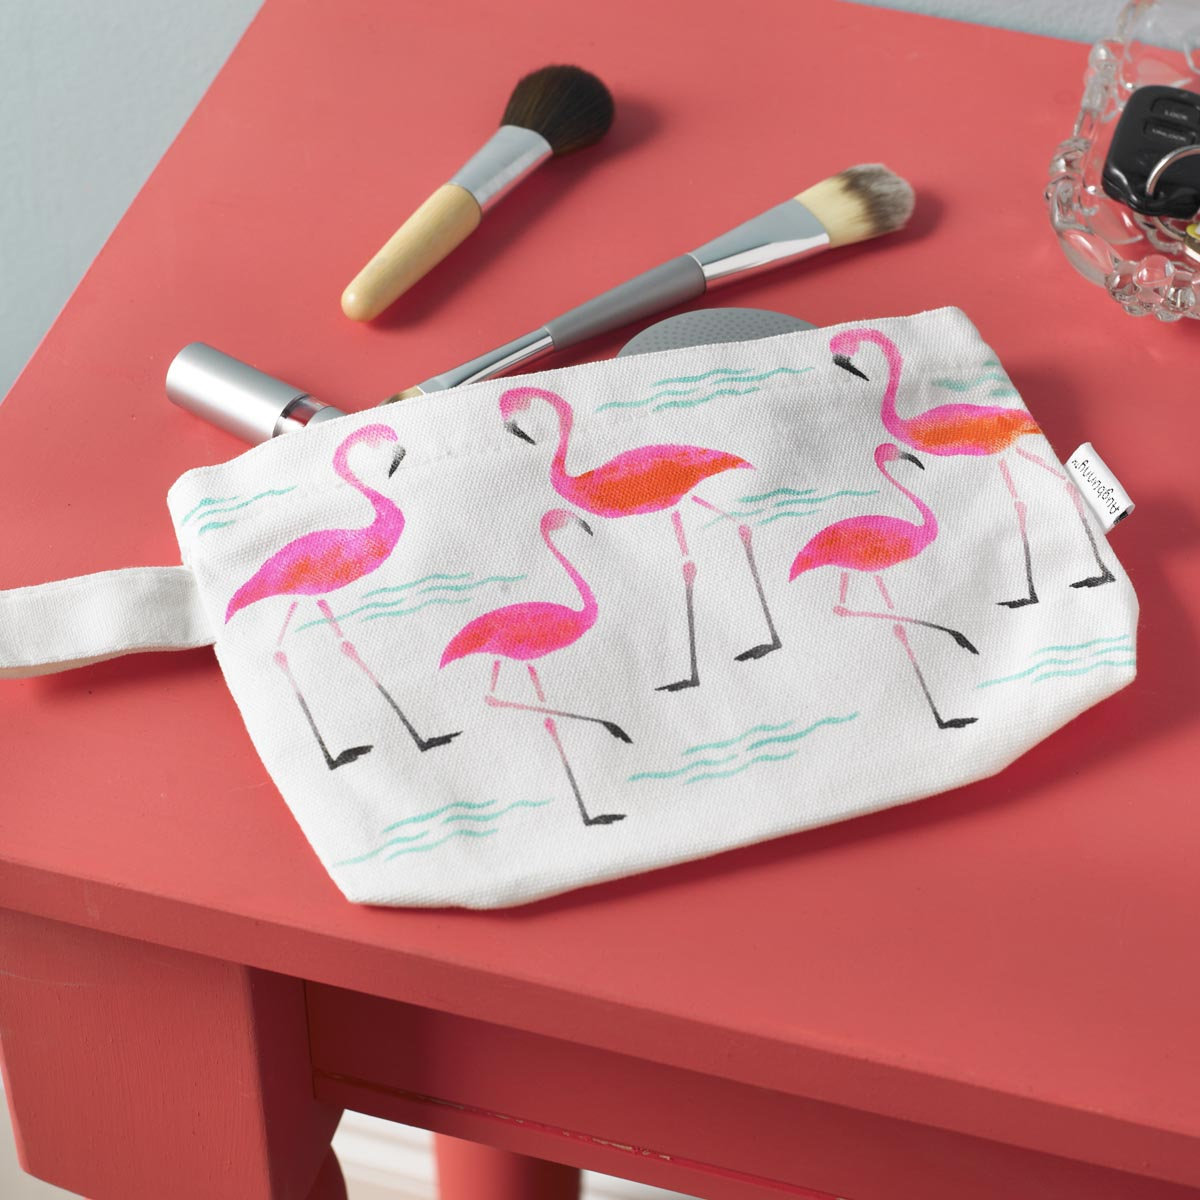 FolkArt ® Painting Stencils - Small - Flamingo